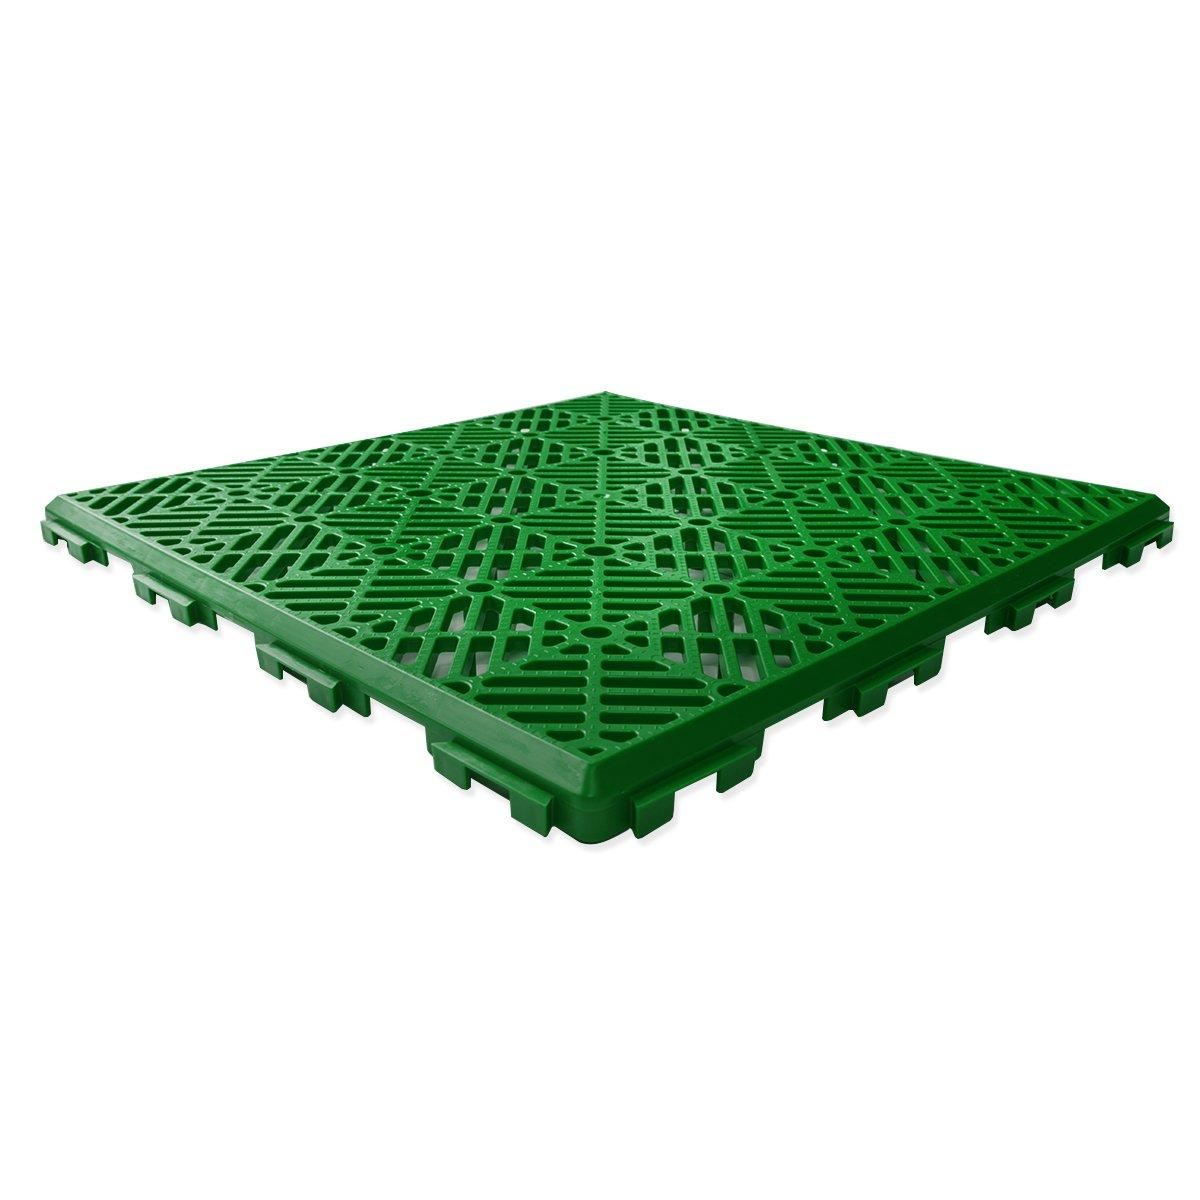 5 Pack - Green Garden Non Slip Interlocking Path Tiles KCT Home